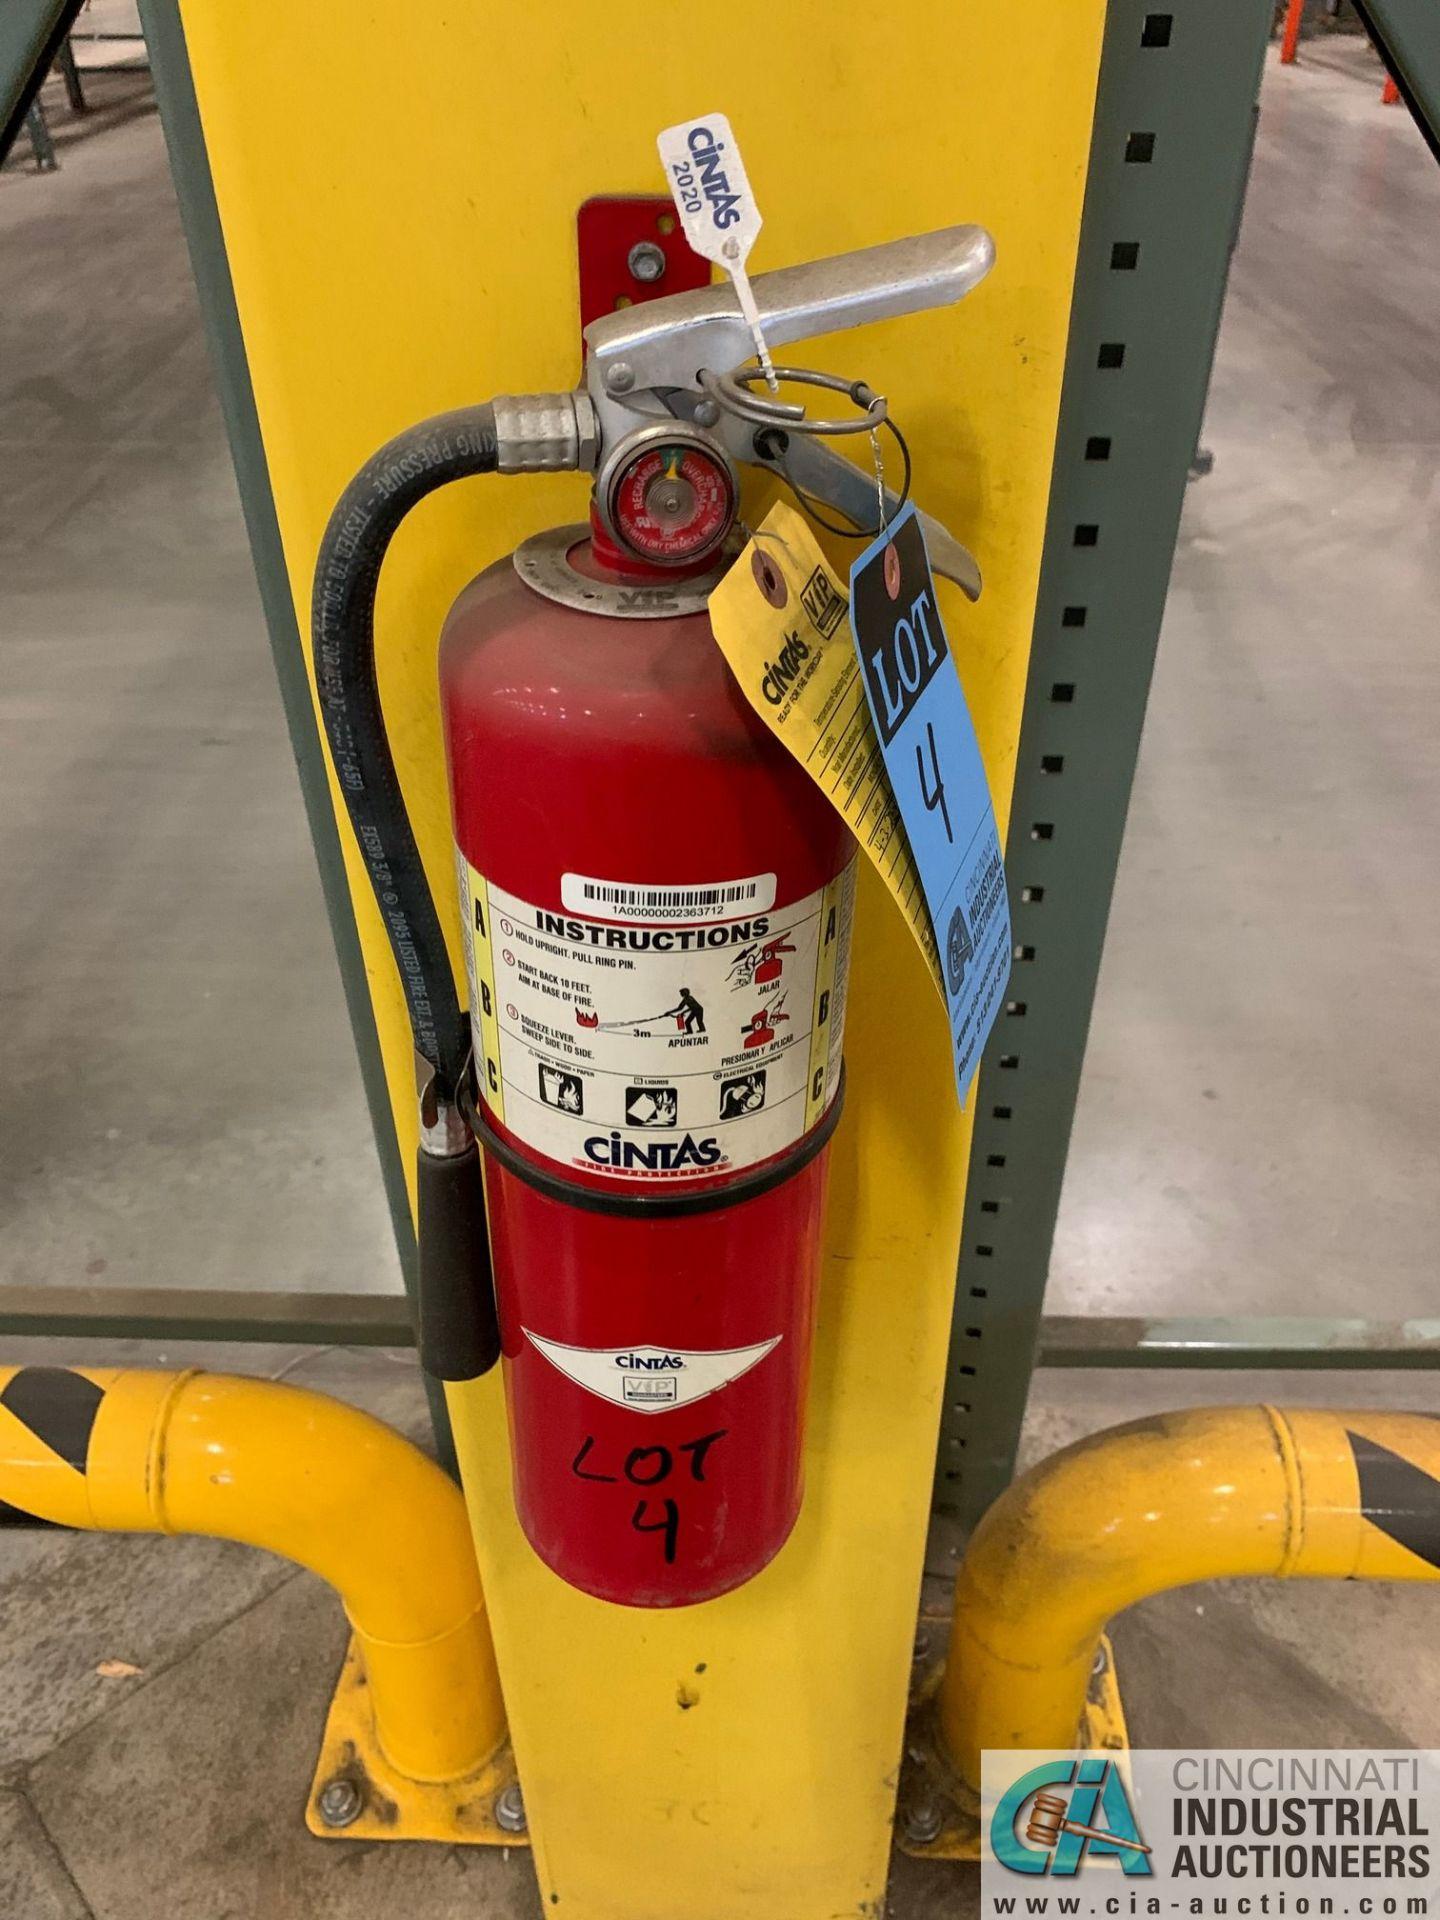 APPROX. (50) FIRE EXTINGUISHER (5400 OAKLEY INDUSTRIAL BLVD., FAIRBURN, GA 30213)